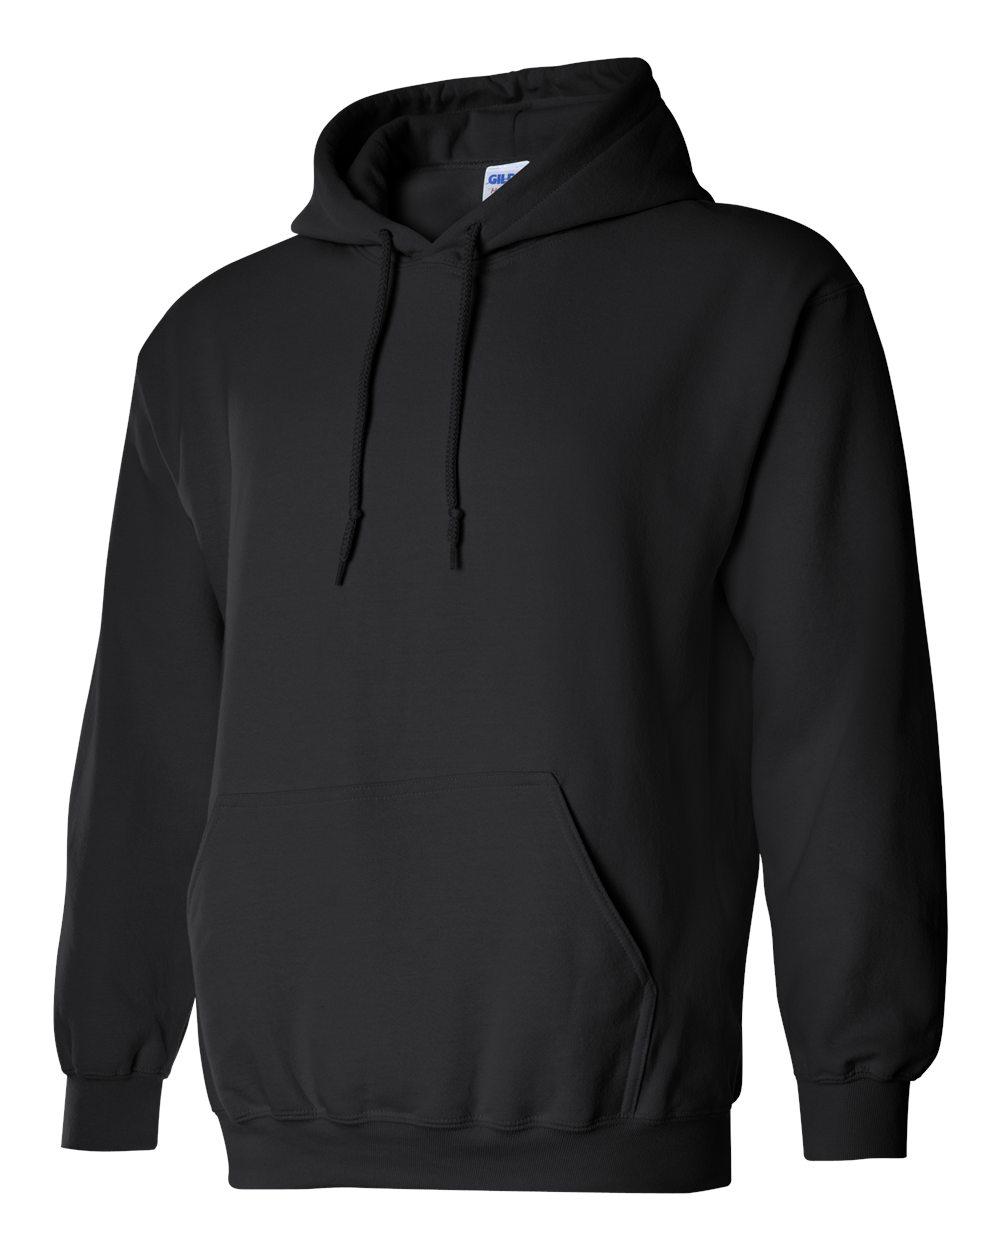 Gildan Heavy Blend Hooded Sweatshirt GI18500 Black